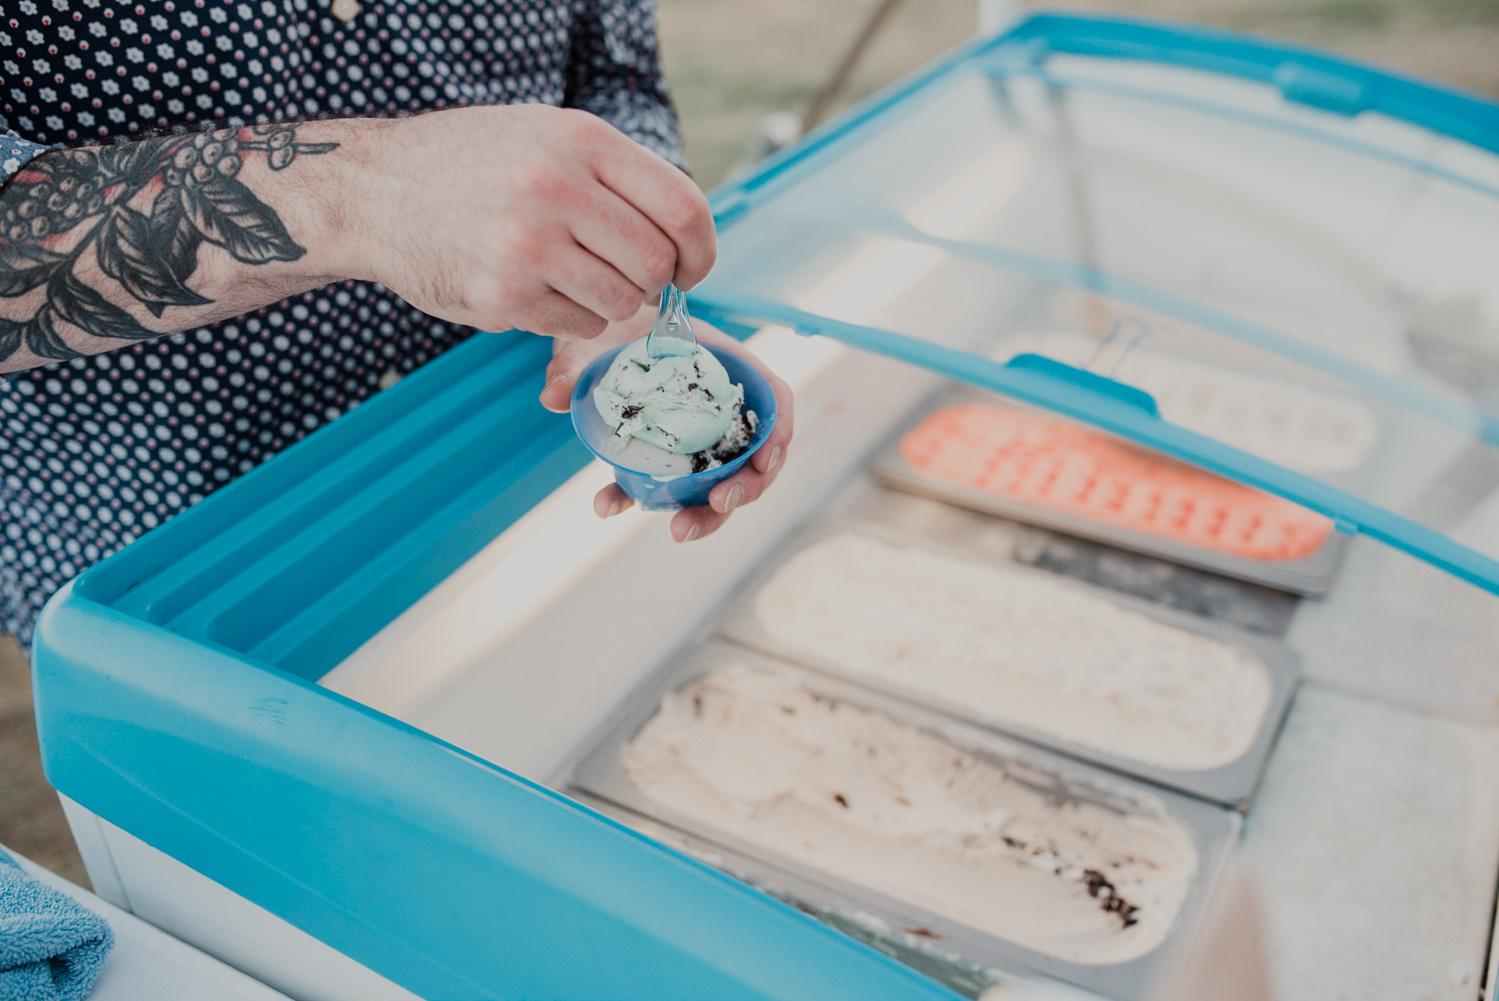 scottish highland creamery dishes up ice cream to wedding reception guests